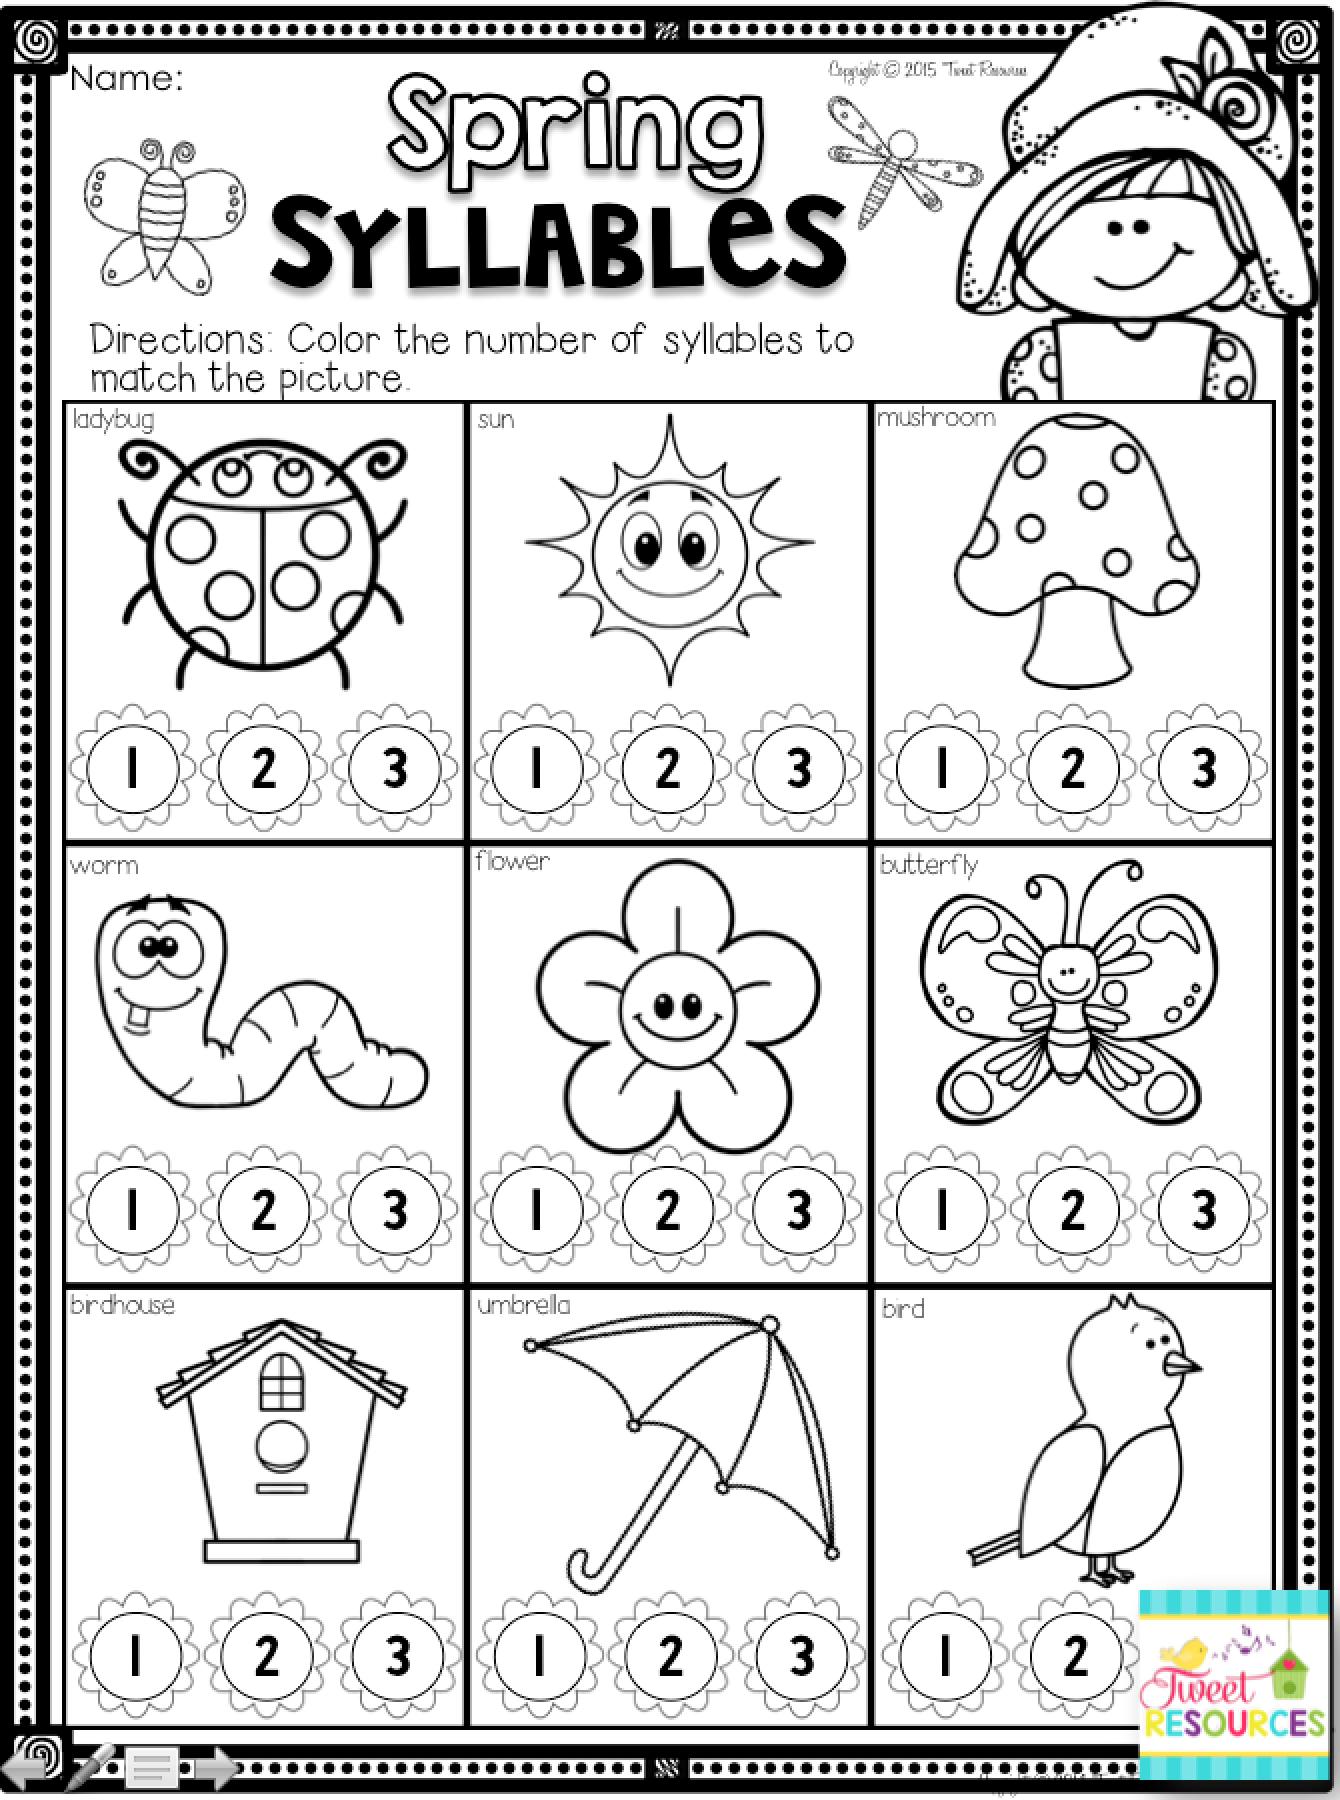 spring activities math and literacy printables for kindergarten kindergarten classroom. Black Bedroom Furniture Sets. Home Design Ideas